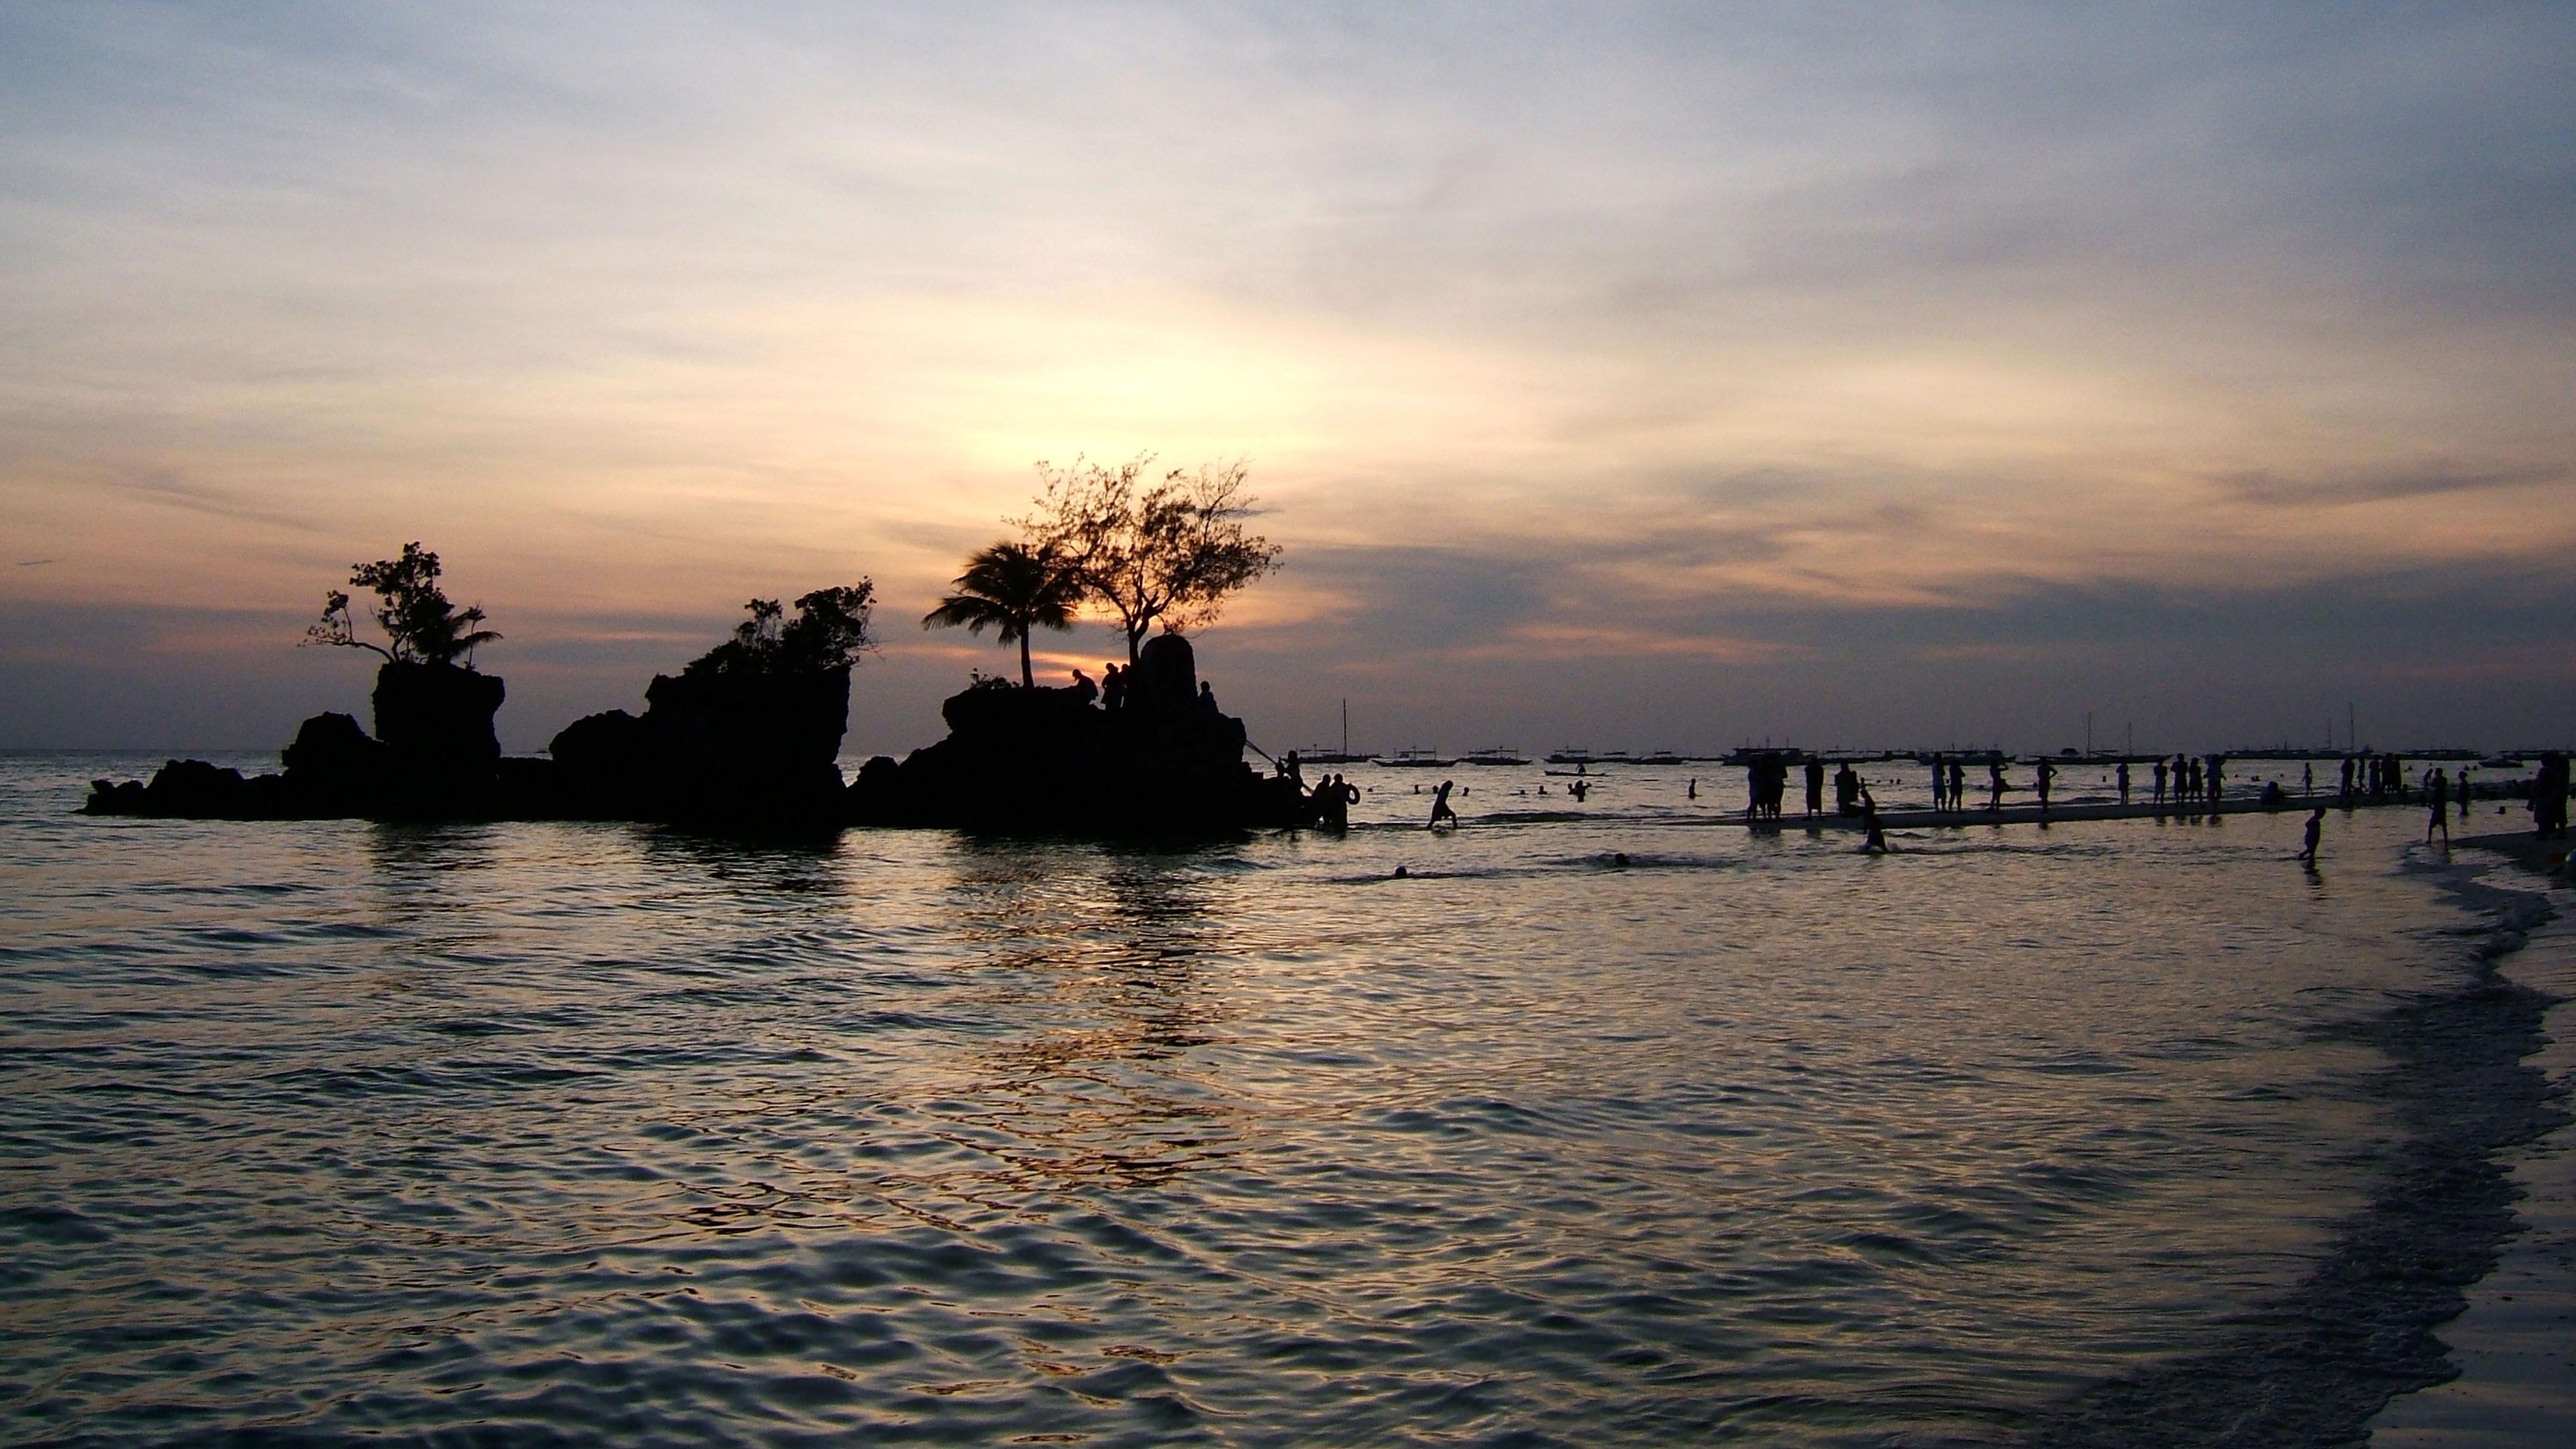 Philippines Panay Negros Caticlan Boracay White Beach Sunset Dec 2003 10